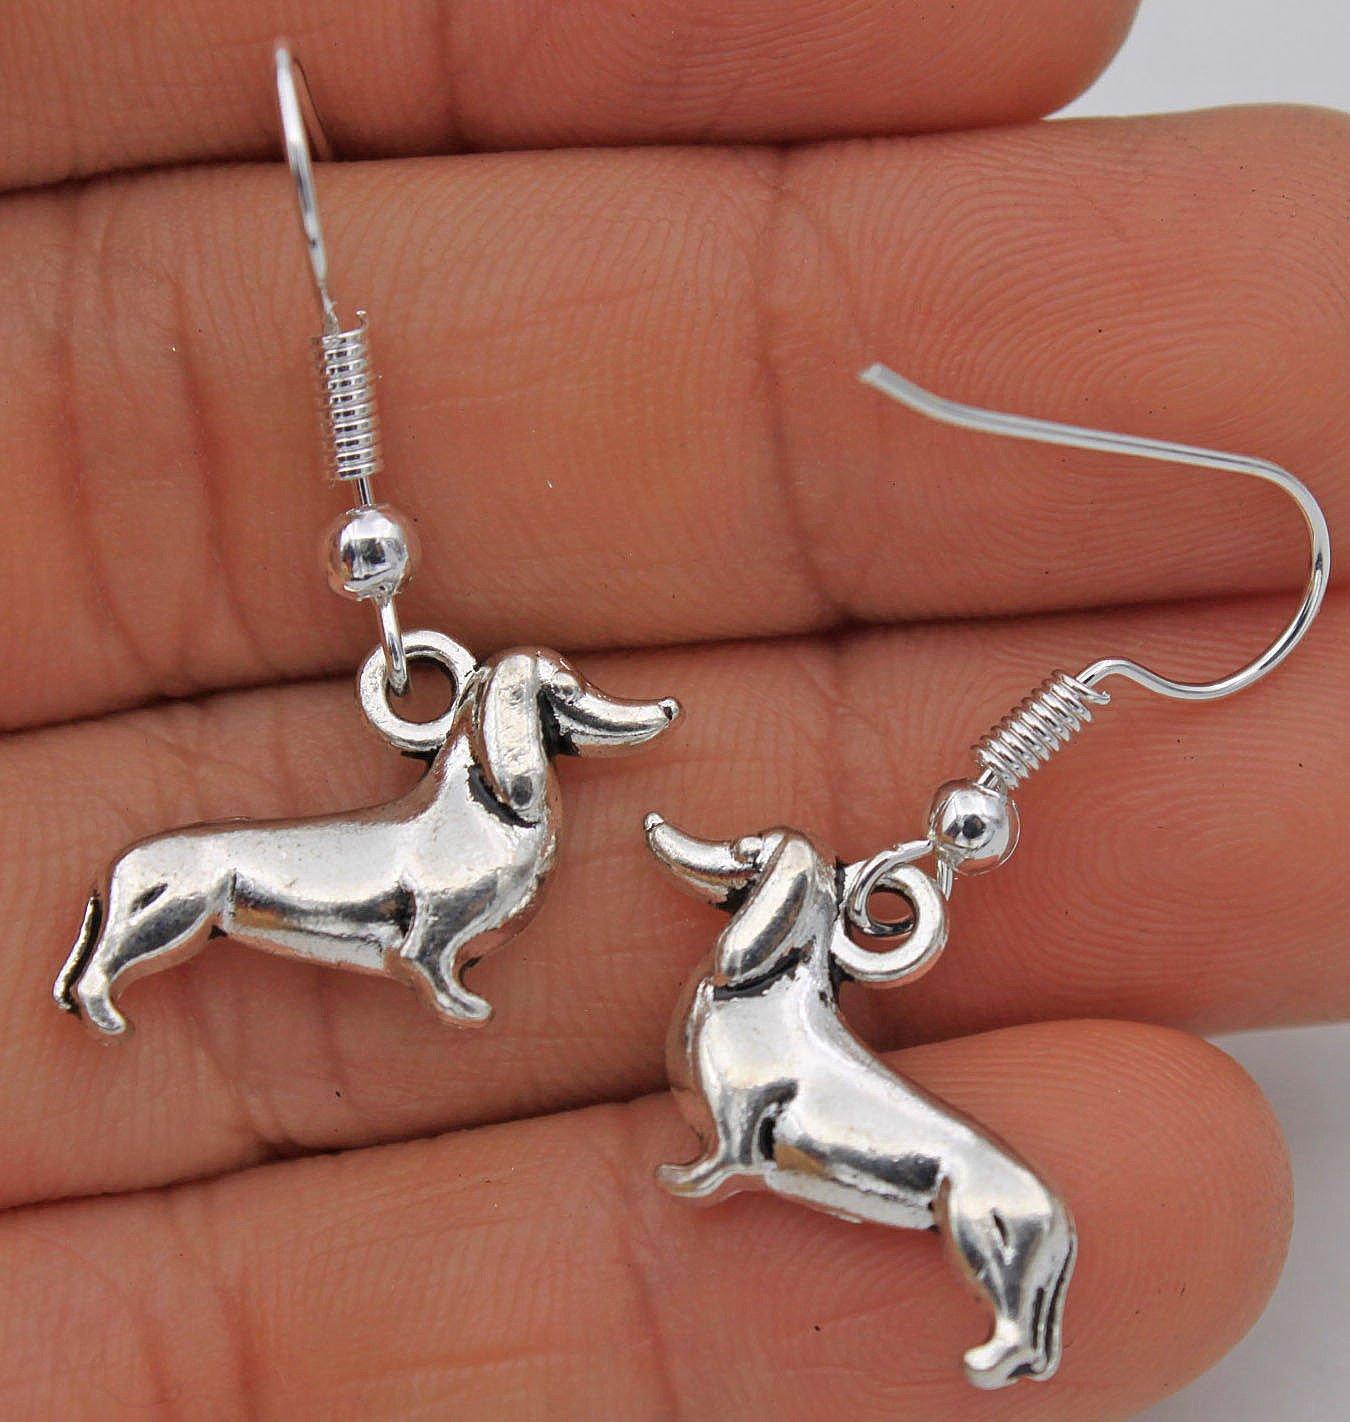 phitak Shop 925 Silver Plated Hook 1.4 Retro Dog Dachshund Women Earrings Jewelry #17